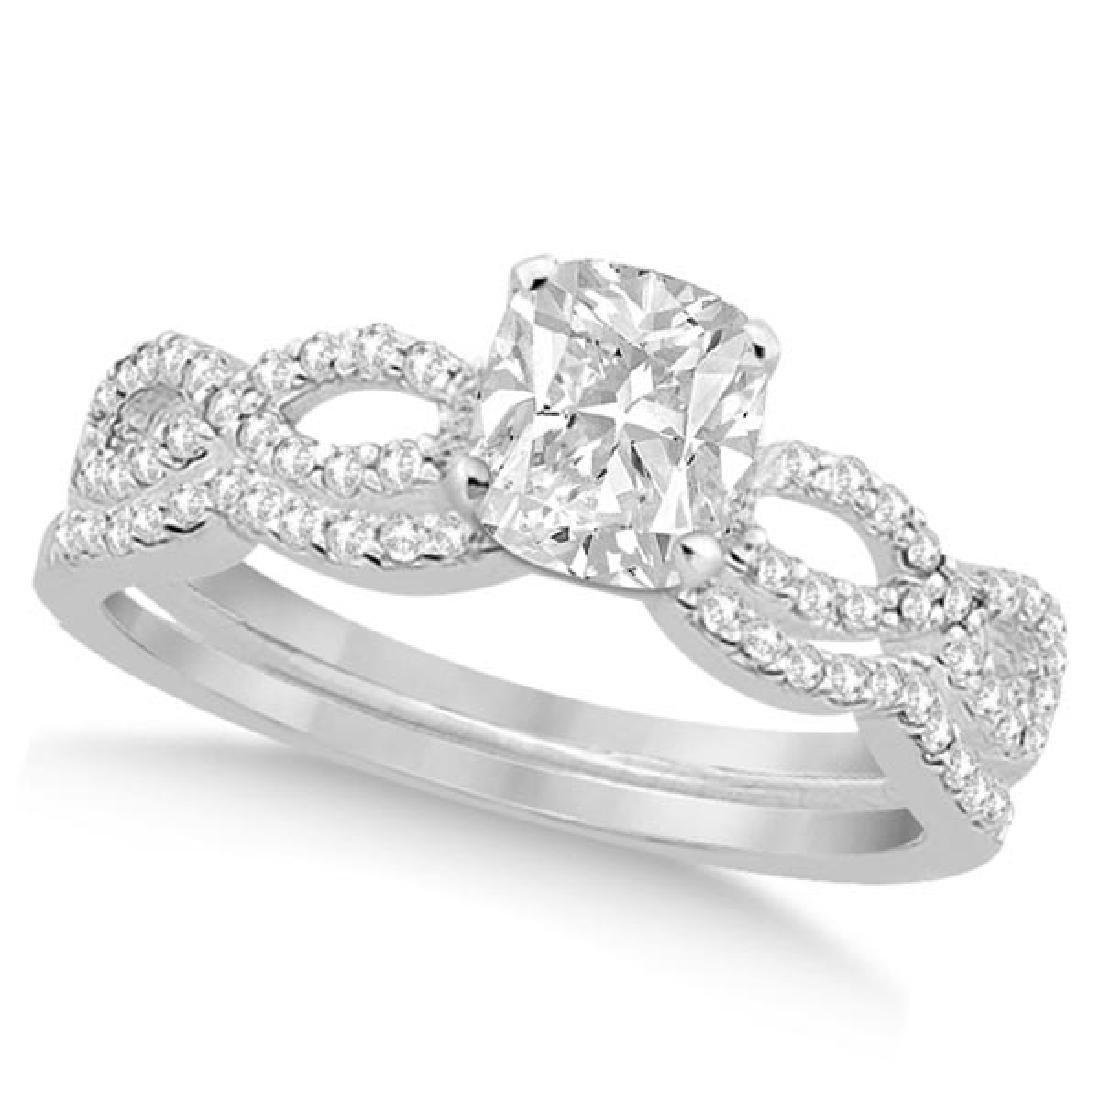 Infinity Cushion-Cut Diamond Bridal Ring Set 14k White